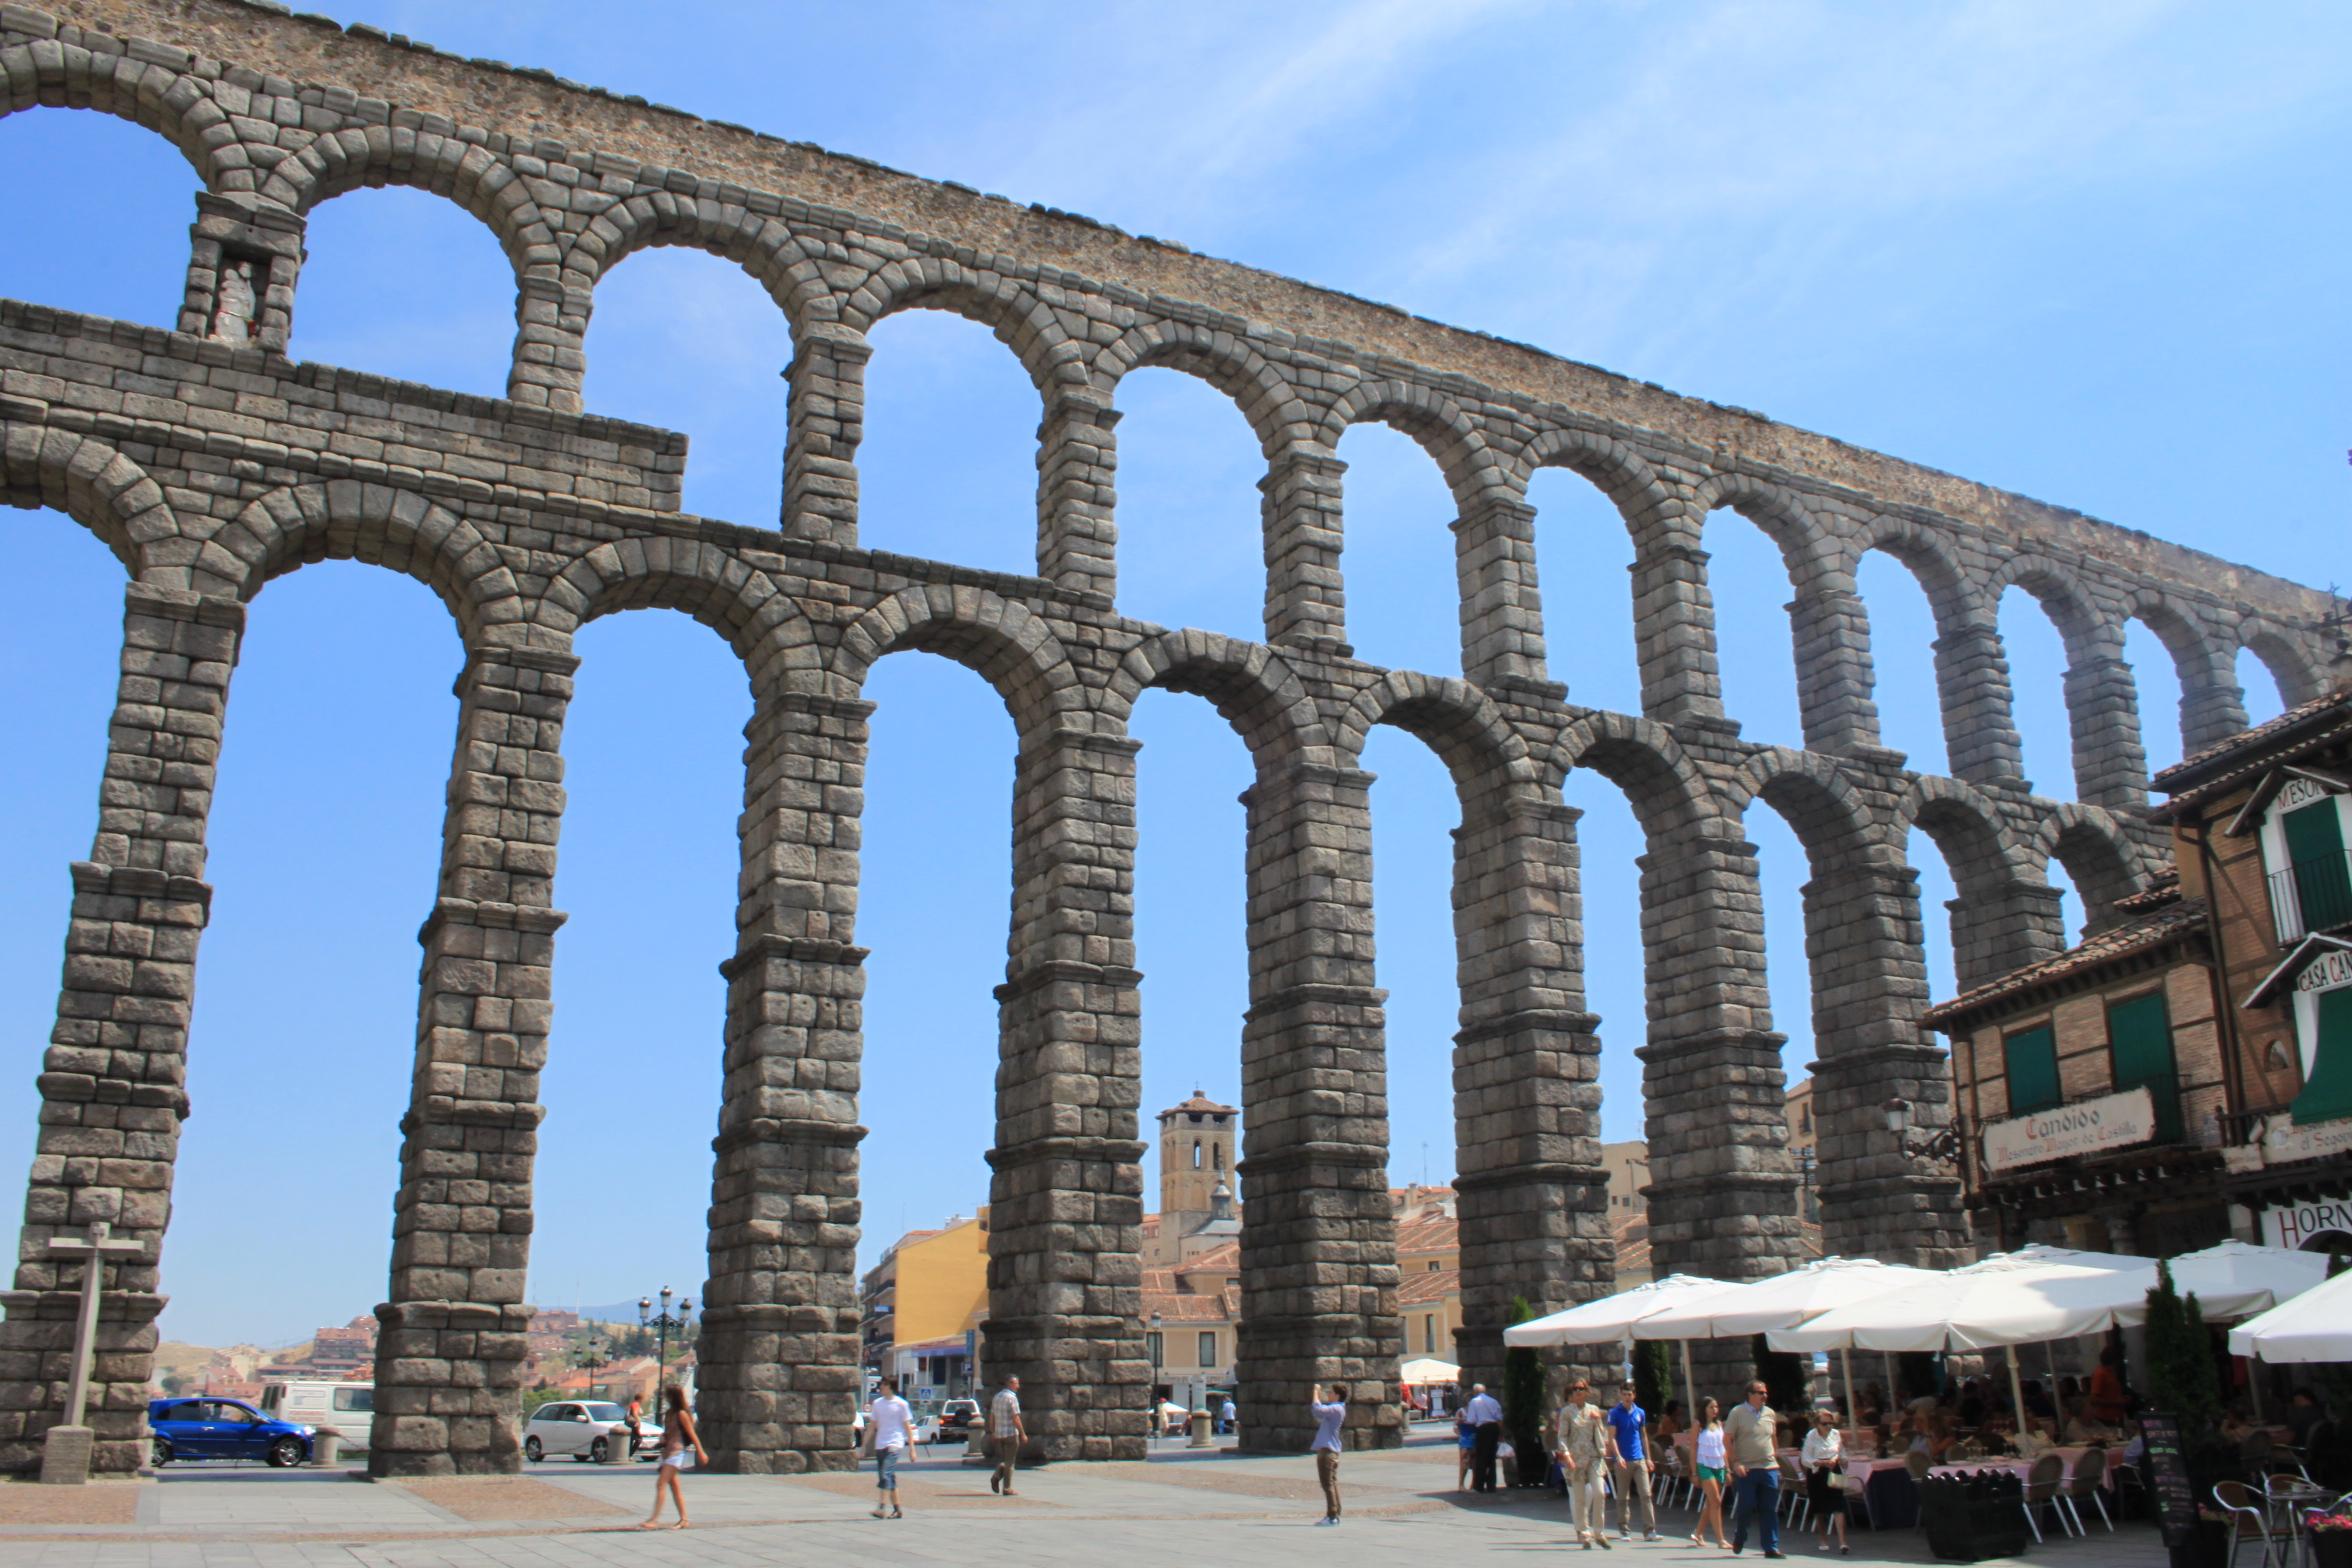 File:Acueducto de Segovia (4).JPG - Wikimedia Commons